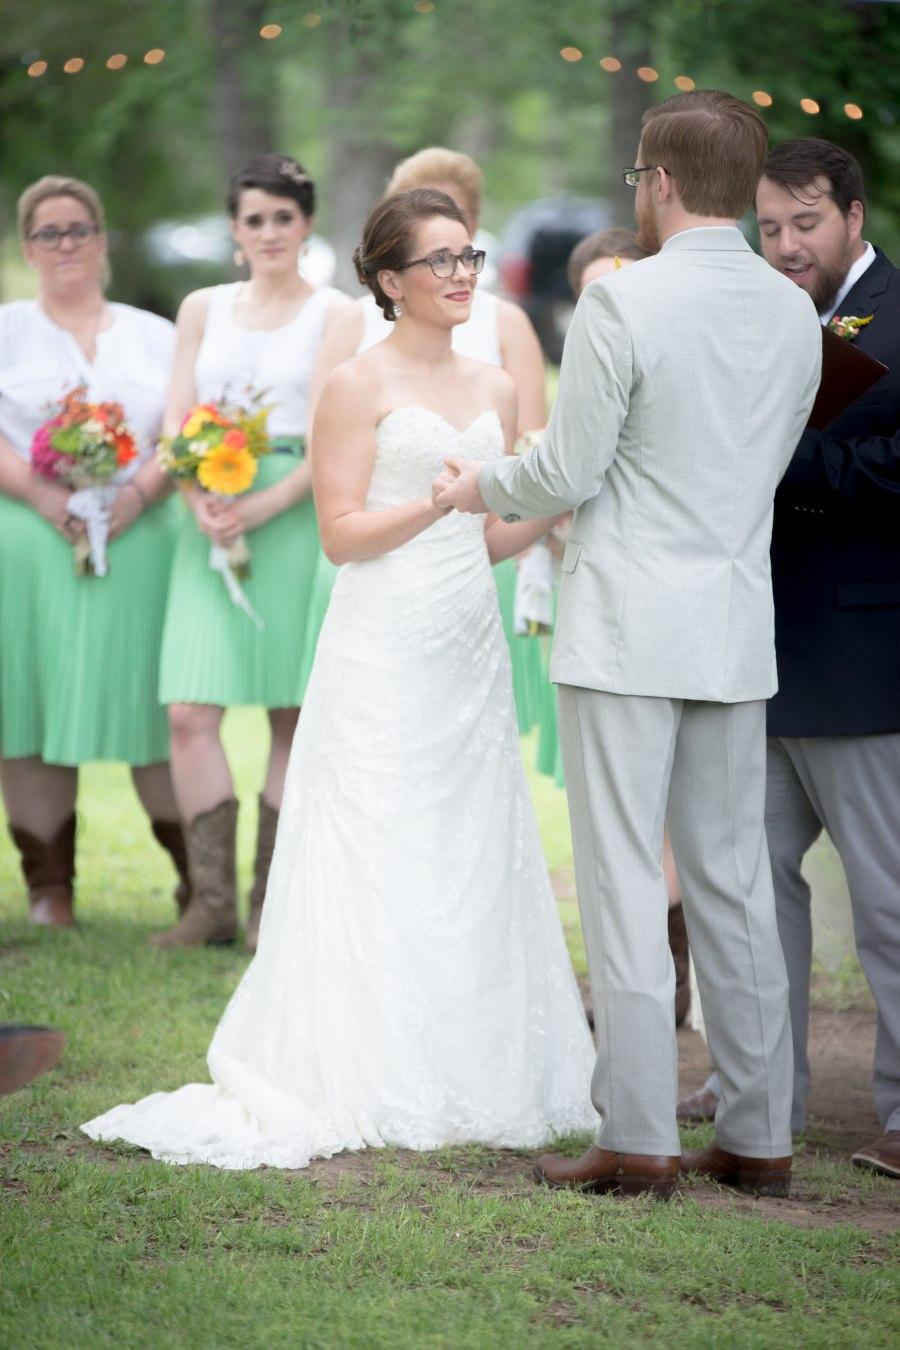 HighDot-Studios-Wedding-Cedar-Bend-Event-Center -Austin-Kim and Mike (28)